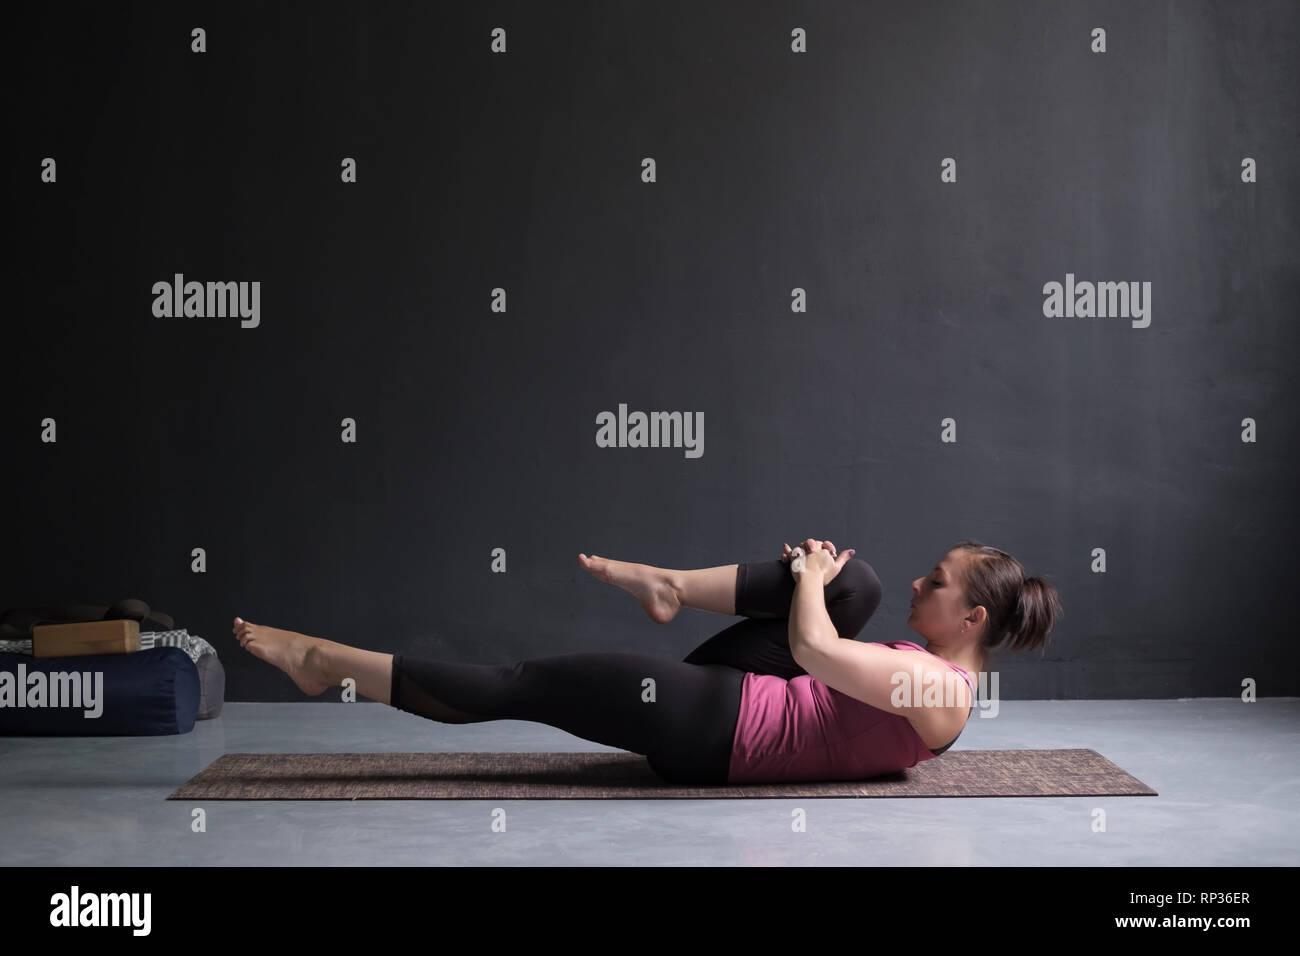 Woman doing Hatha Yoga asana Ardha pawanmuktasana or knees to chest pose. - Stock Image